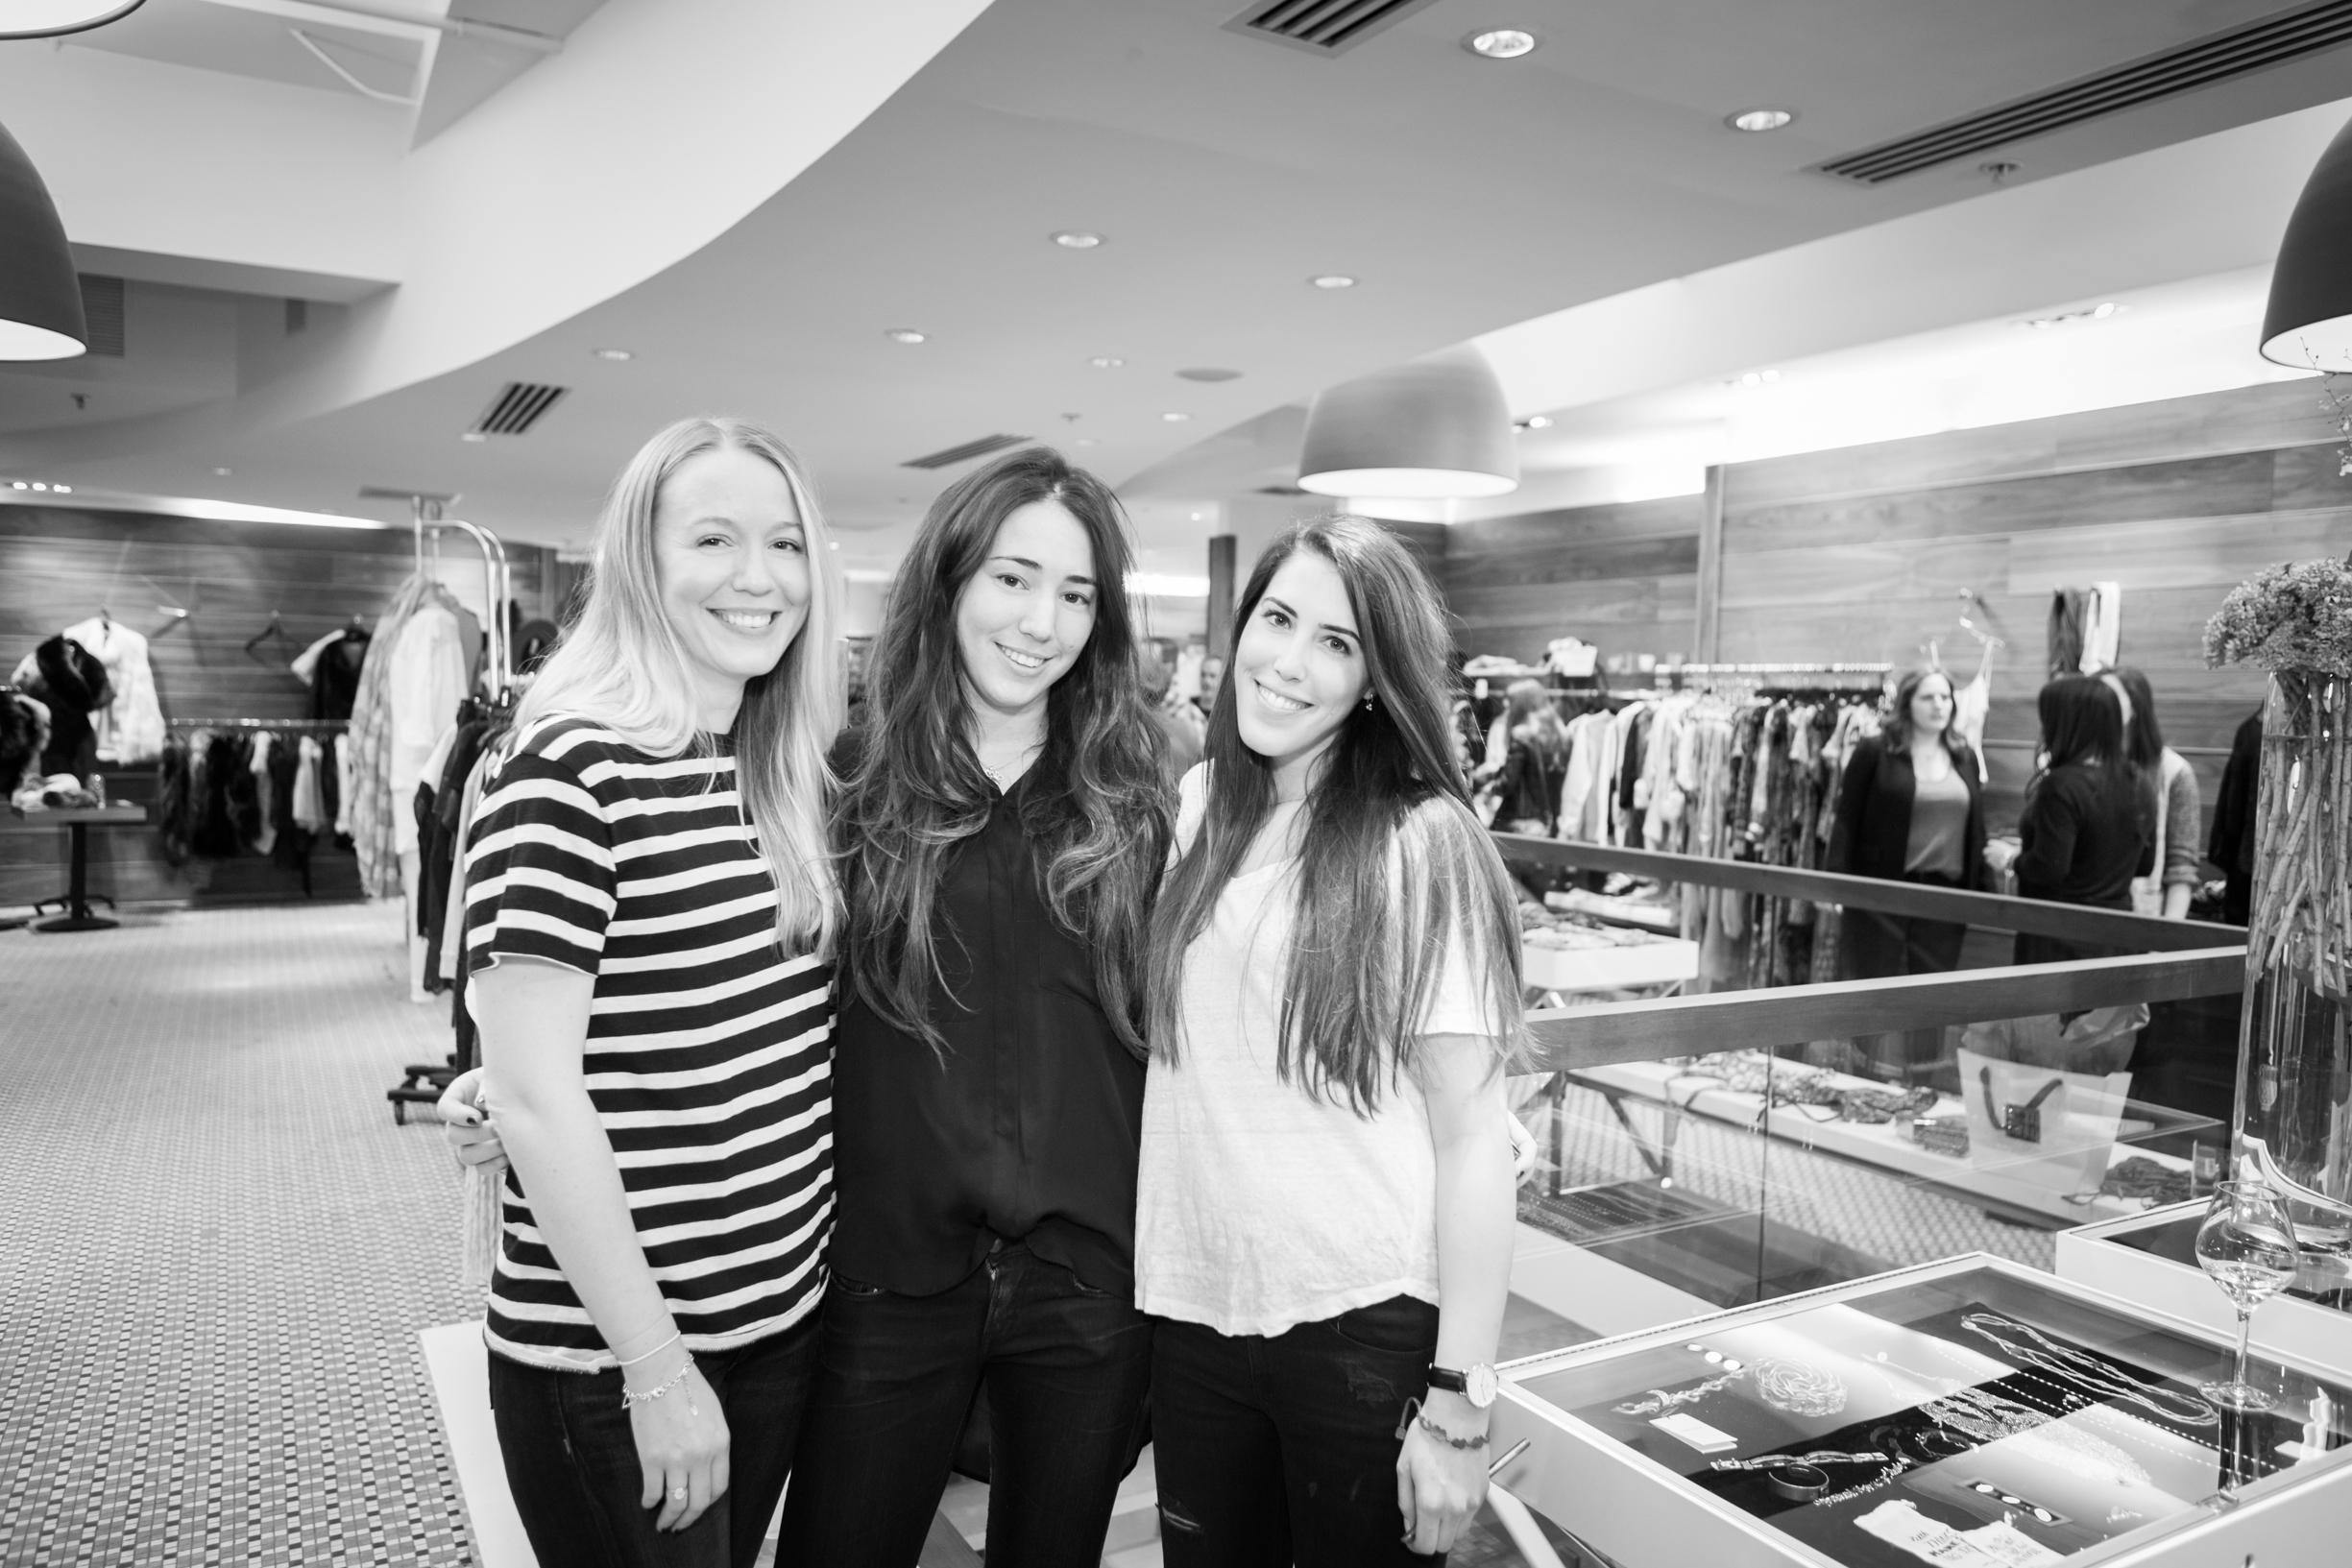 Ashley, Jordan and Maya